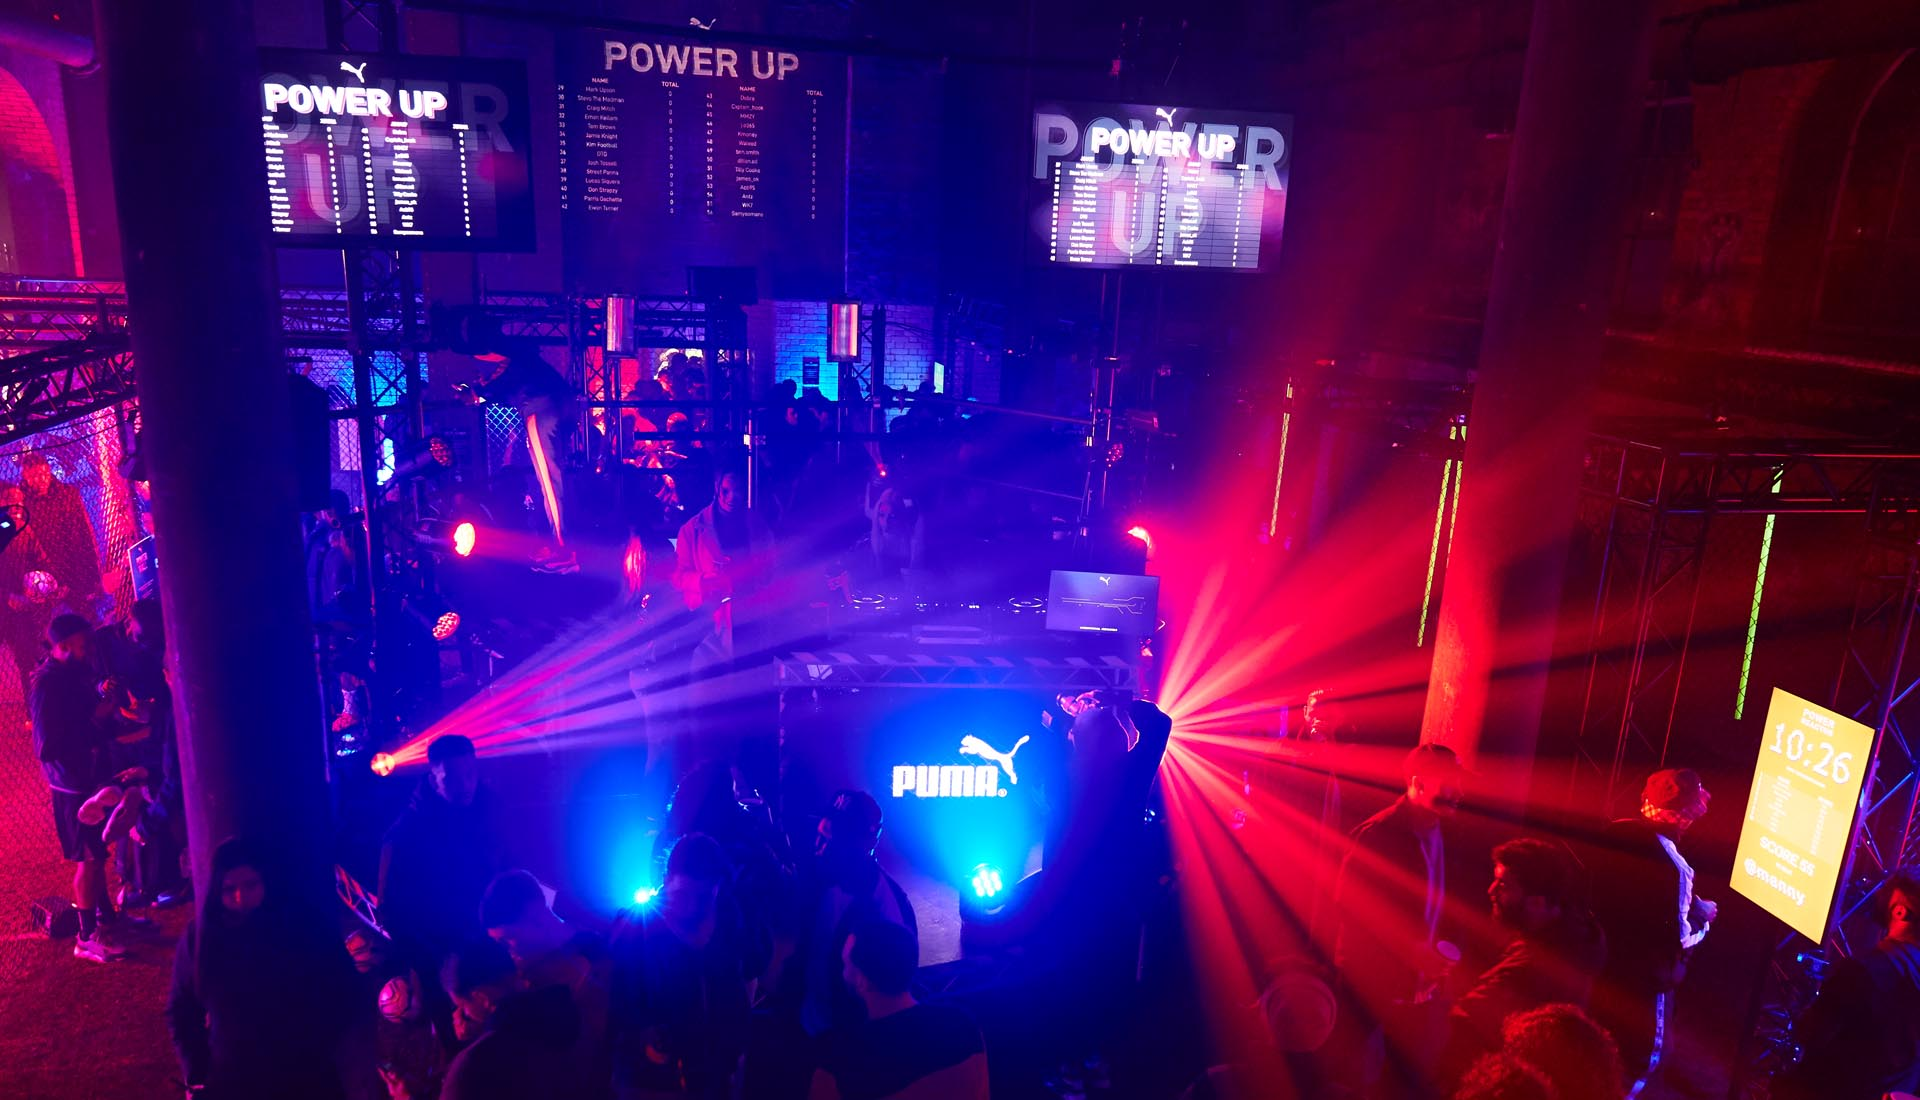 9-puma-power-up-event-london.jpg